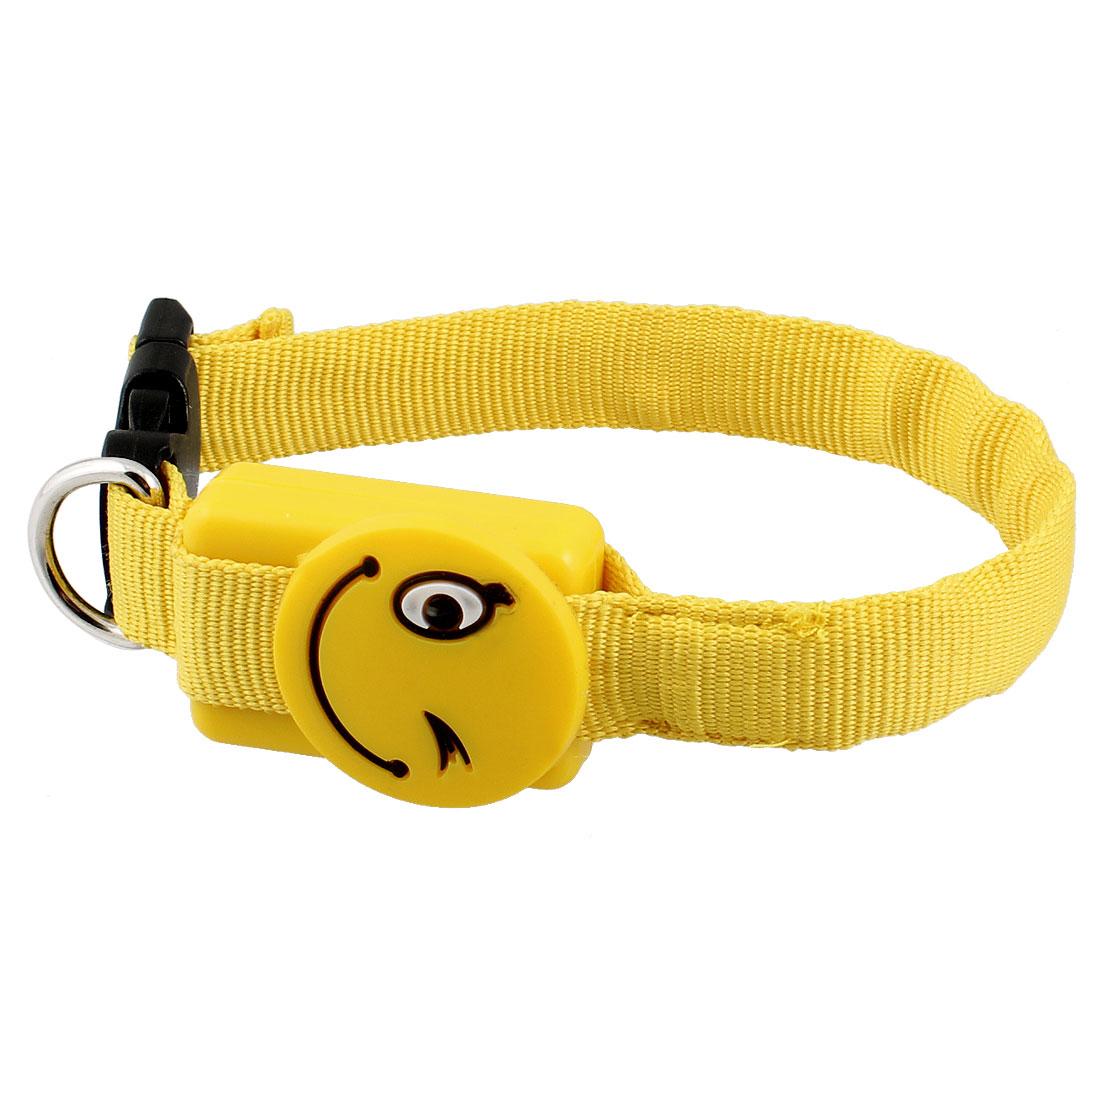 "Smile Pattern Yellow LED Safety Flash Light Up Pet Cat Dog Collar Belt 11"""